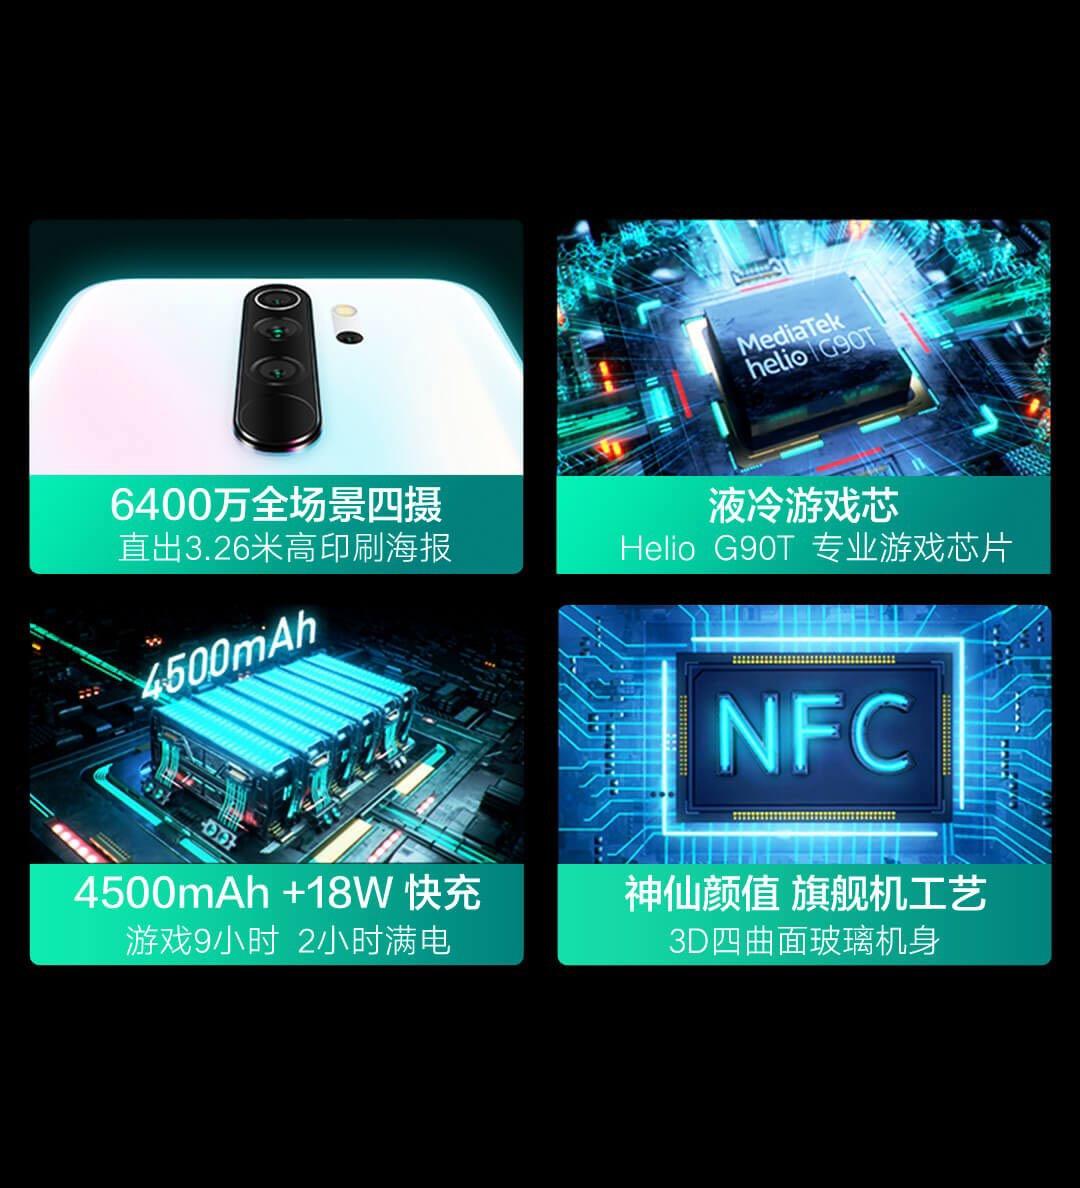 Jinbei 64 million genuine mobile phone 10 full screen 1000 yuan camera smart phone students and elderly